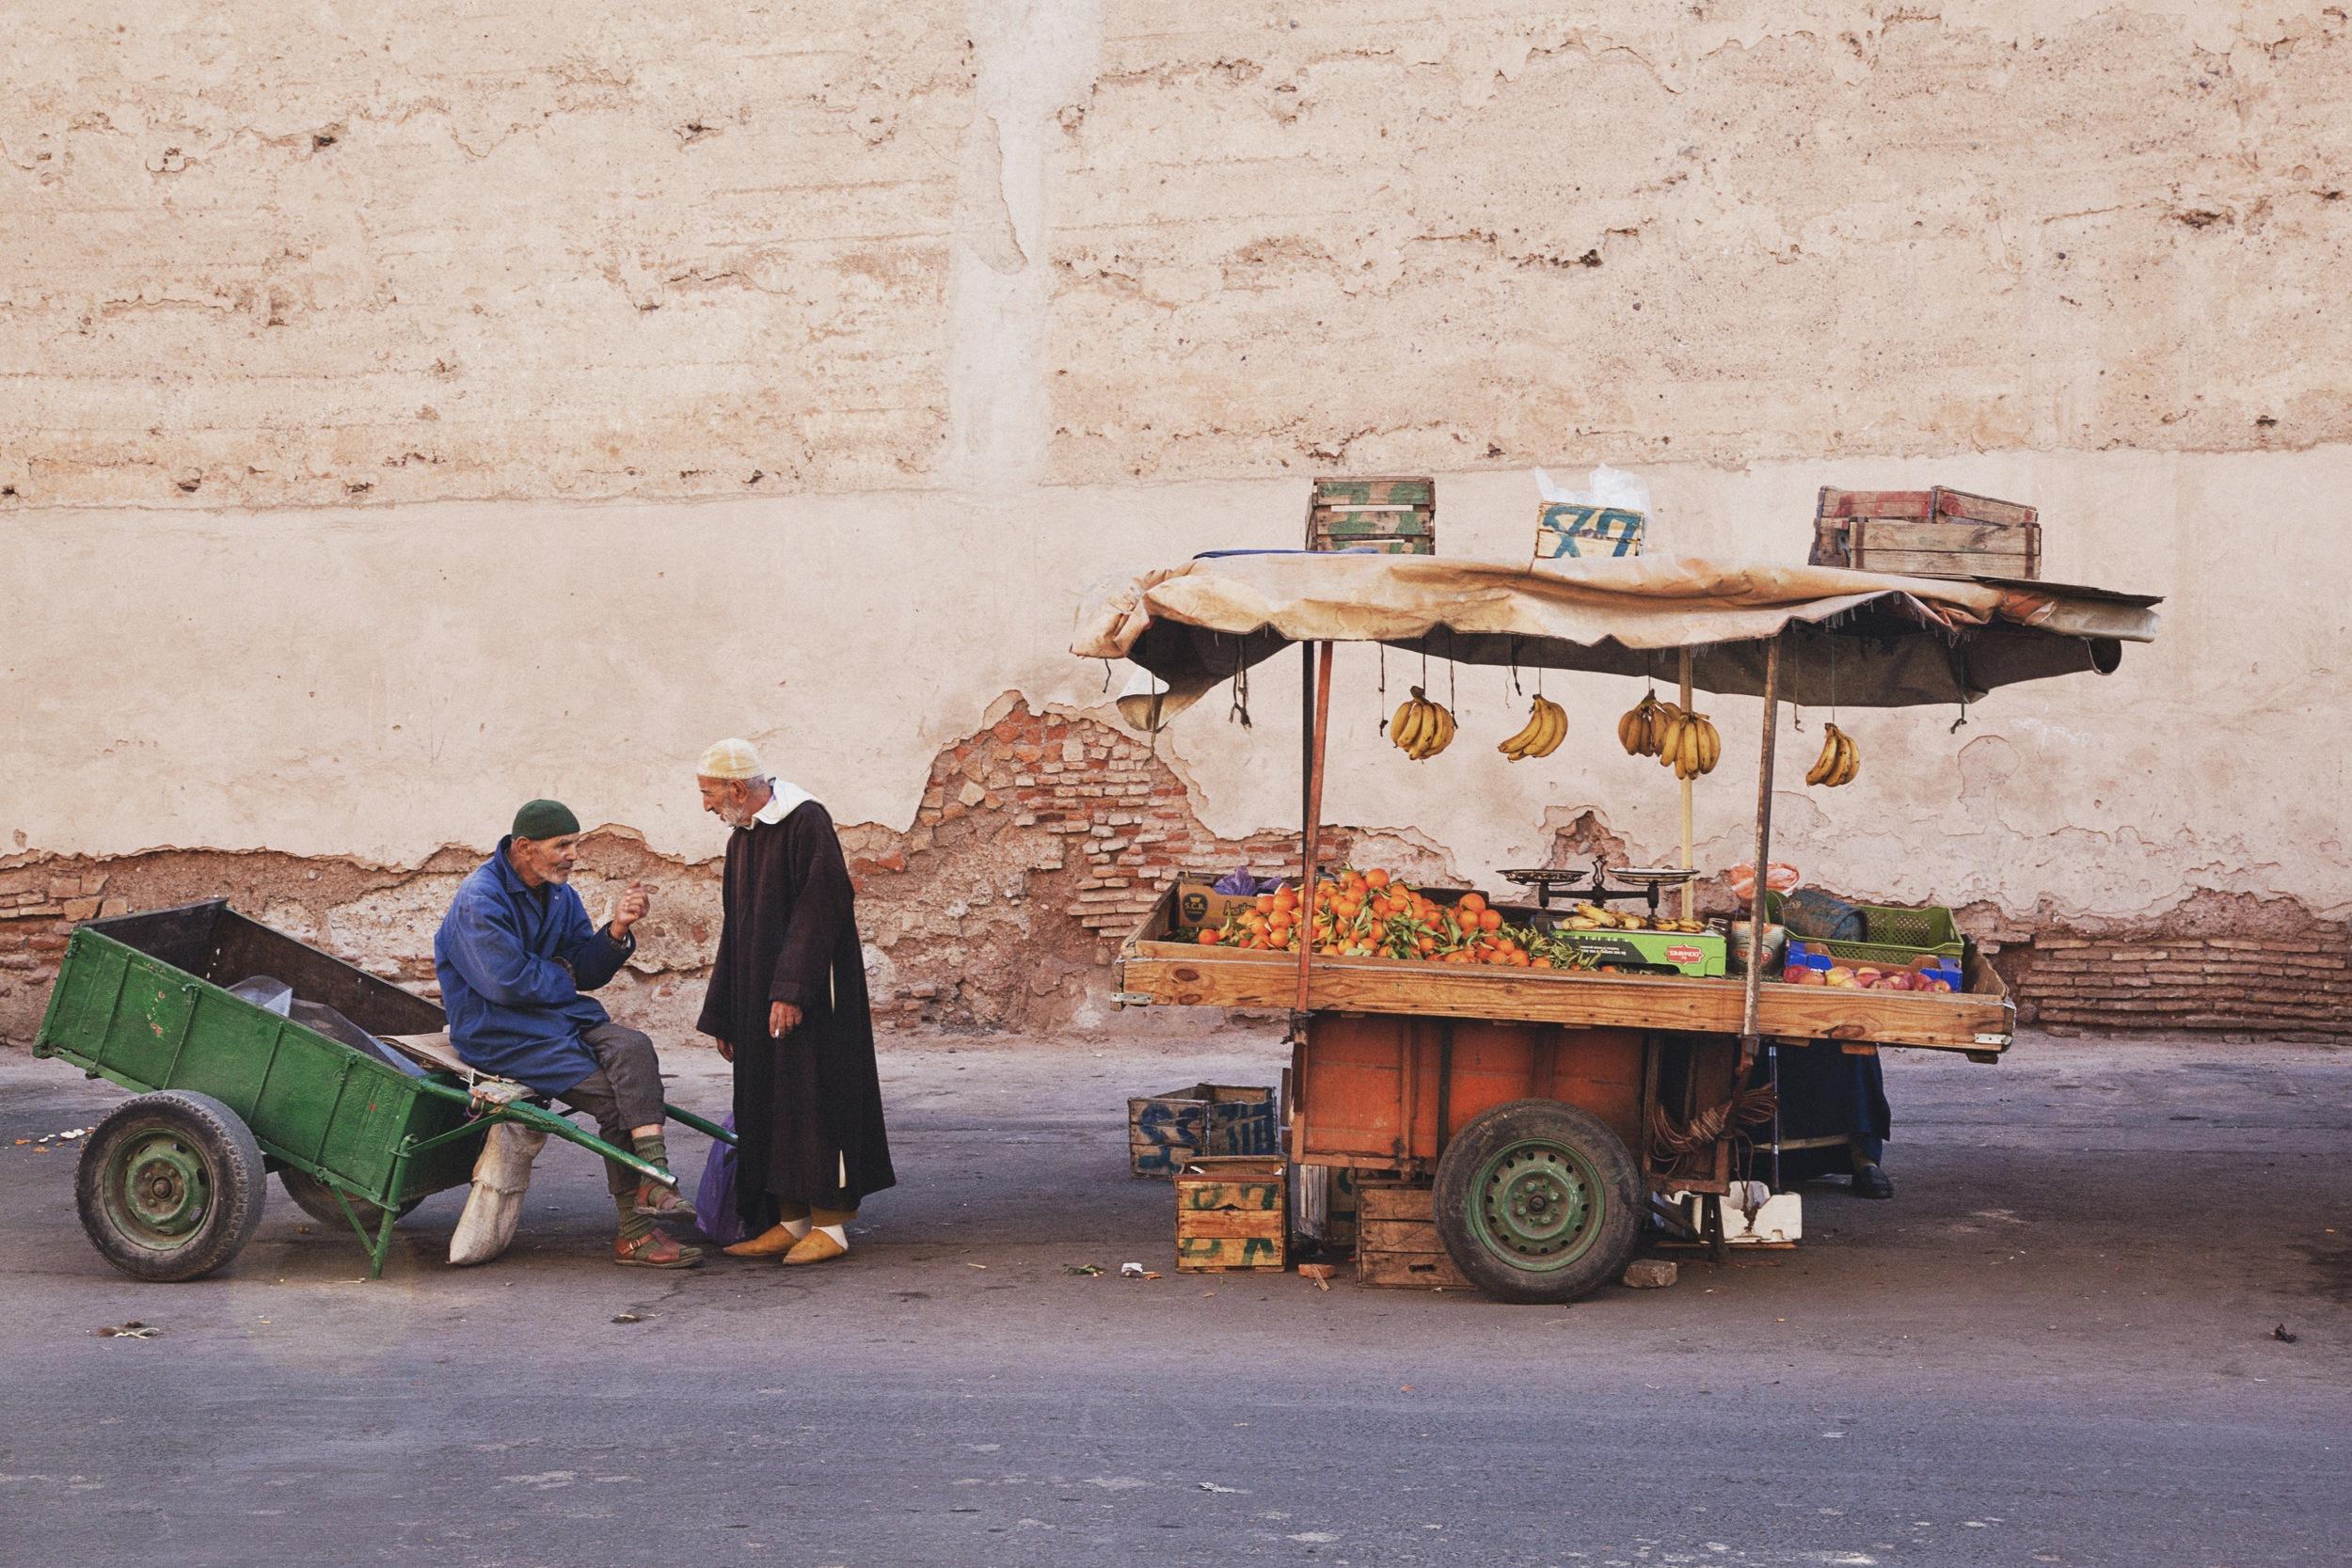 fruit-stand-conversation-travel-photographer.jpg